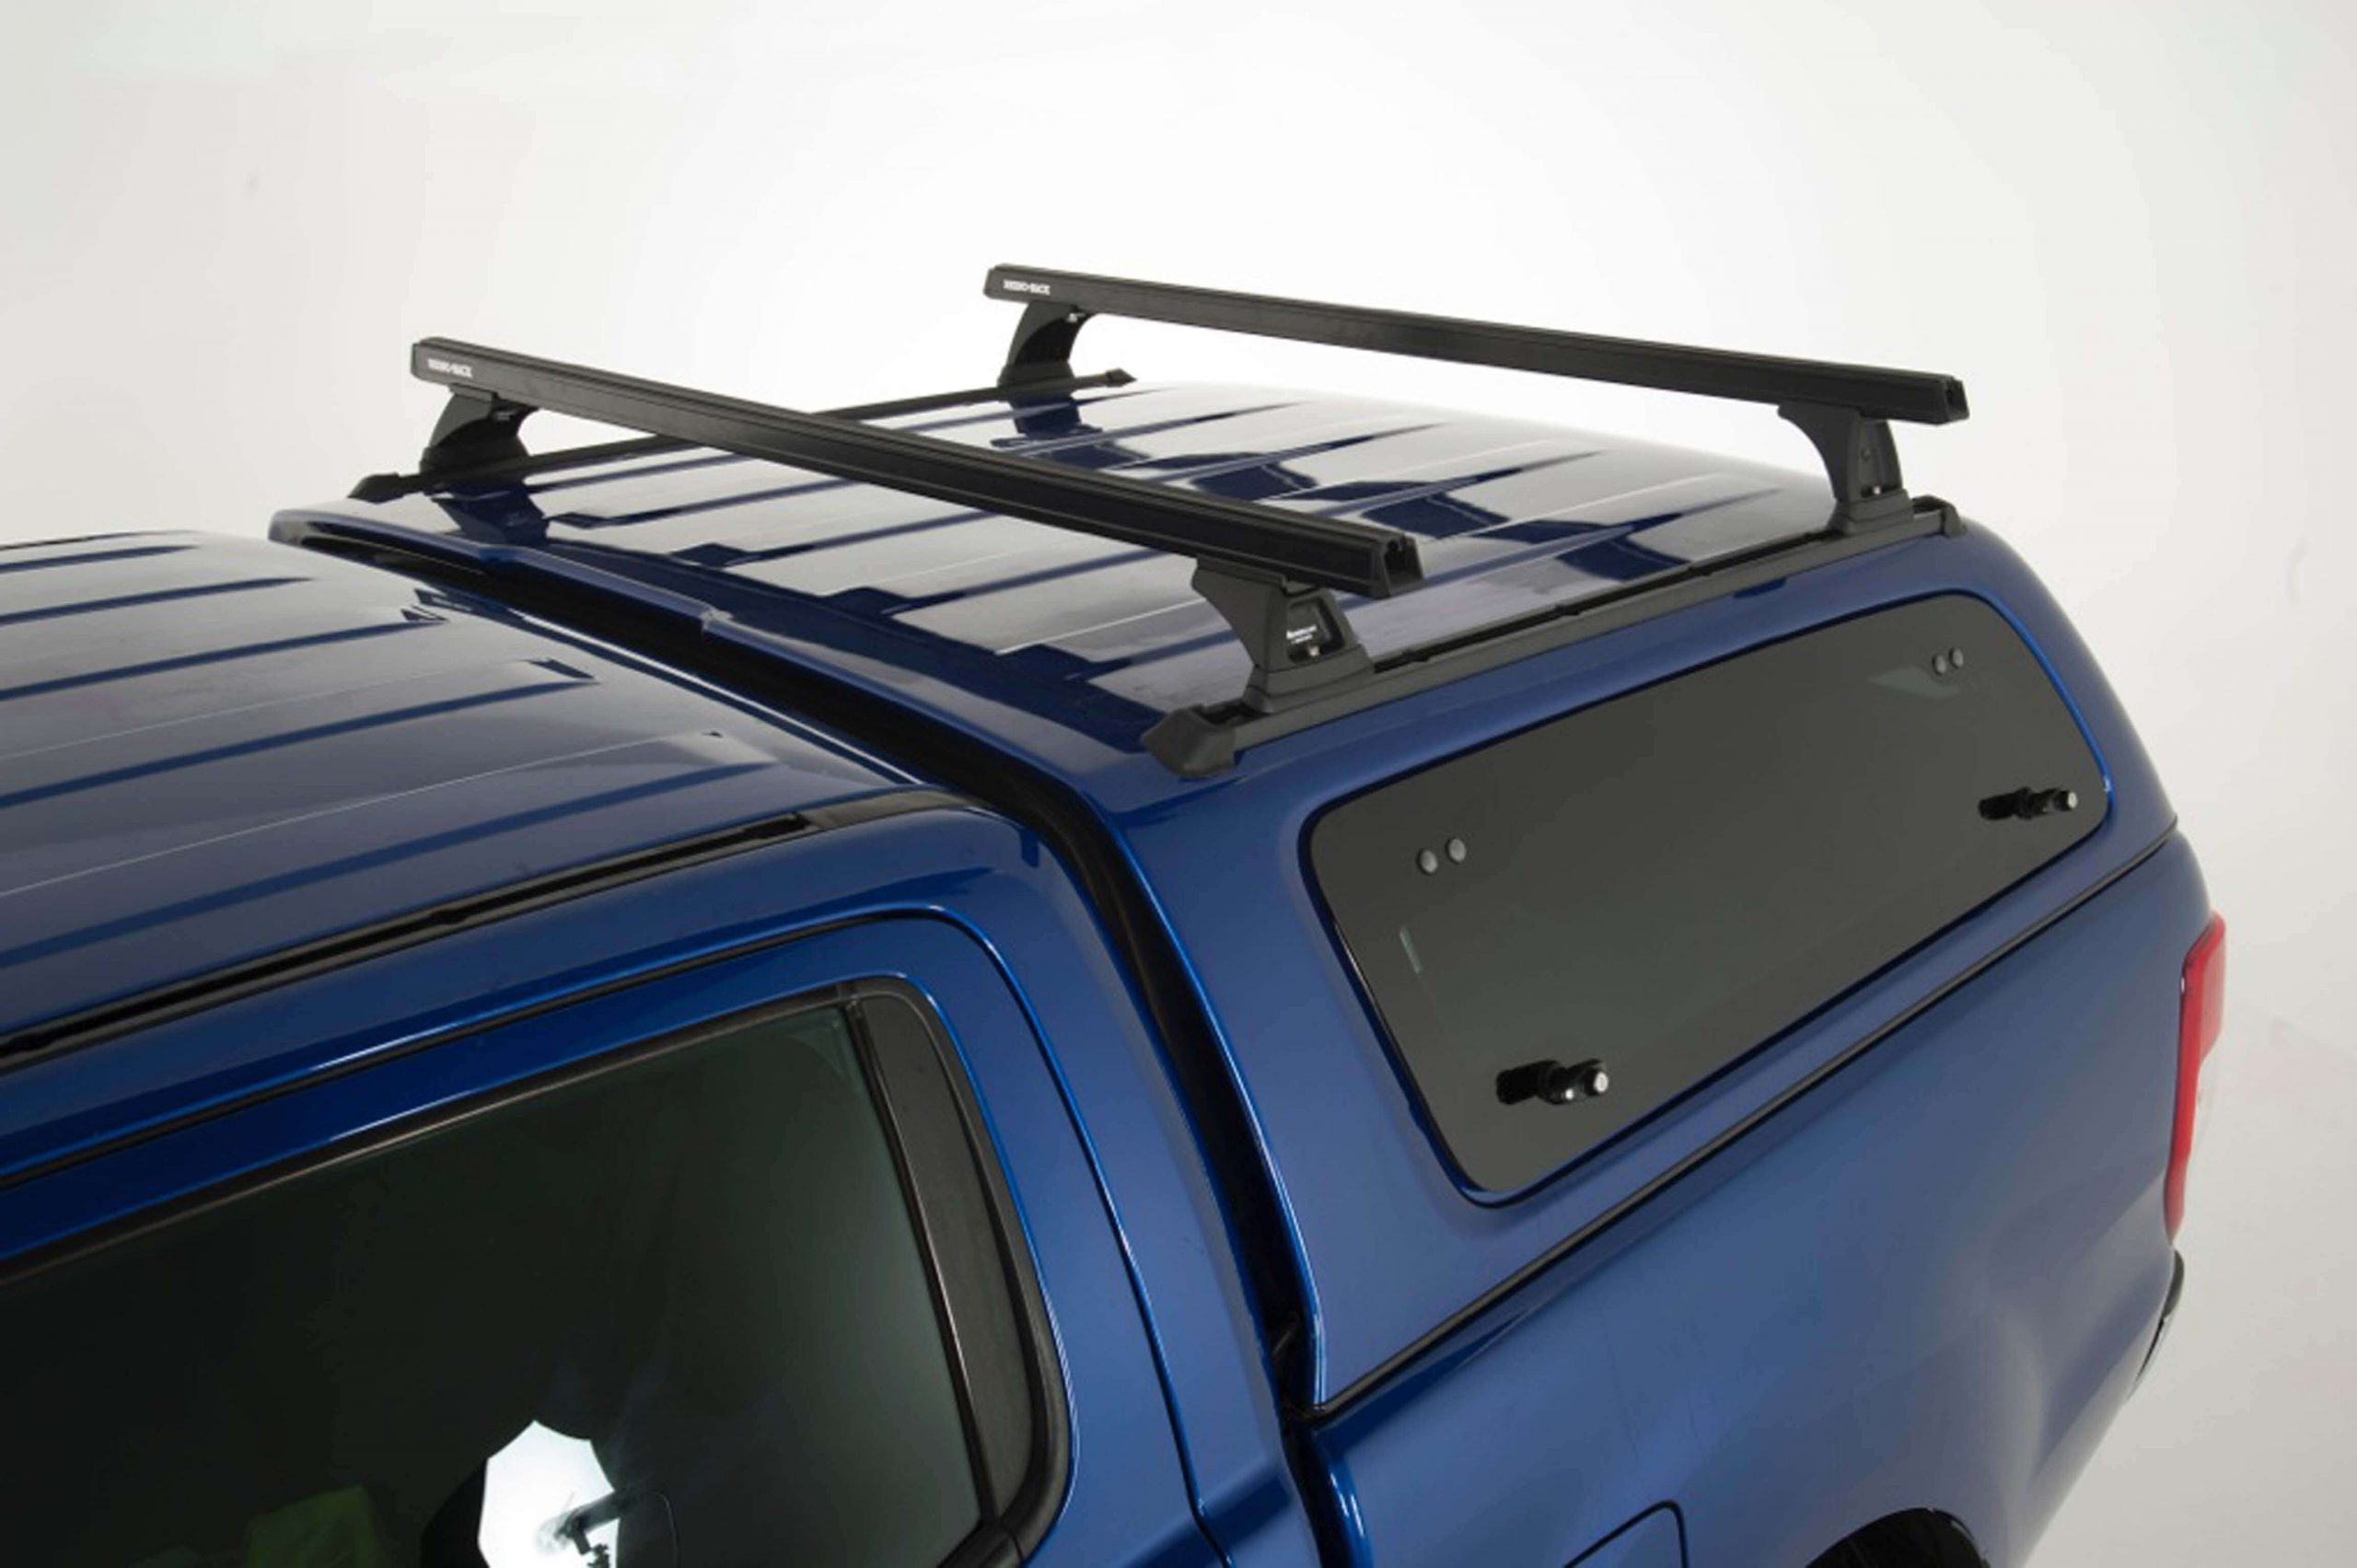 tjm-aeroklas-ute-canopy-roofracks-central-locking-bt50-mazda-dandenong-pakenham